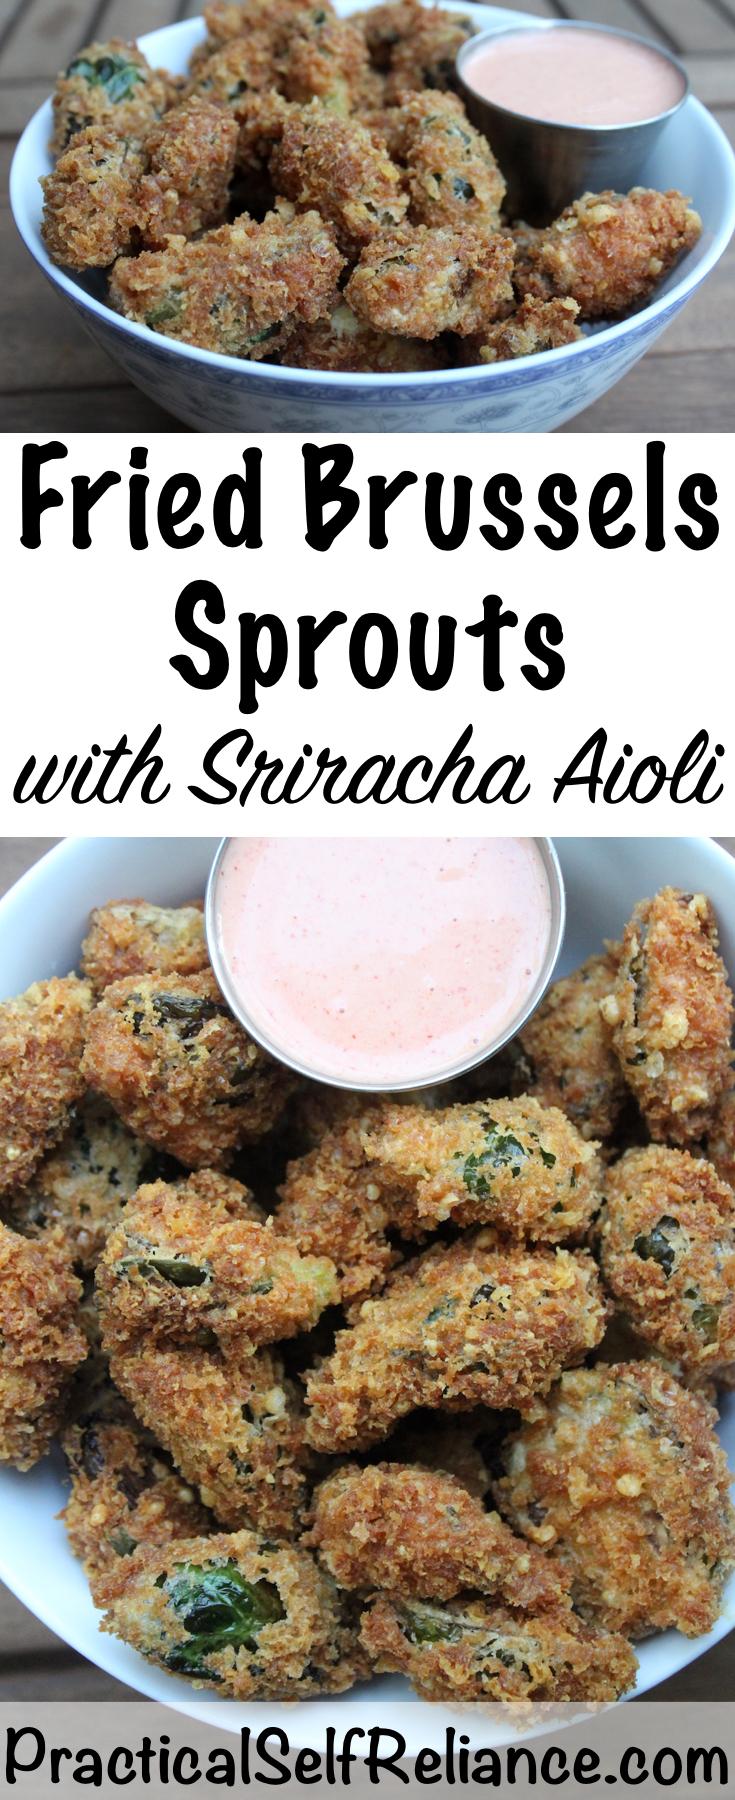 Parmesan & Panko Fried Brussels Sprouts Recipe #brusselssprouts #brusselsprouts  #brusselssproutsrecipes #sriracha #aioli #recipes #friedfood